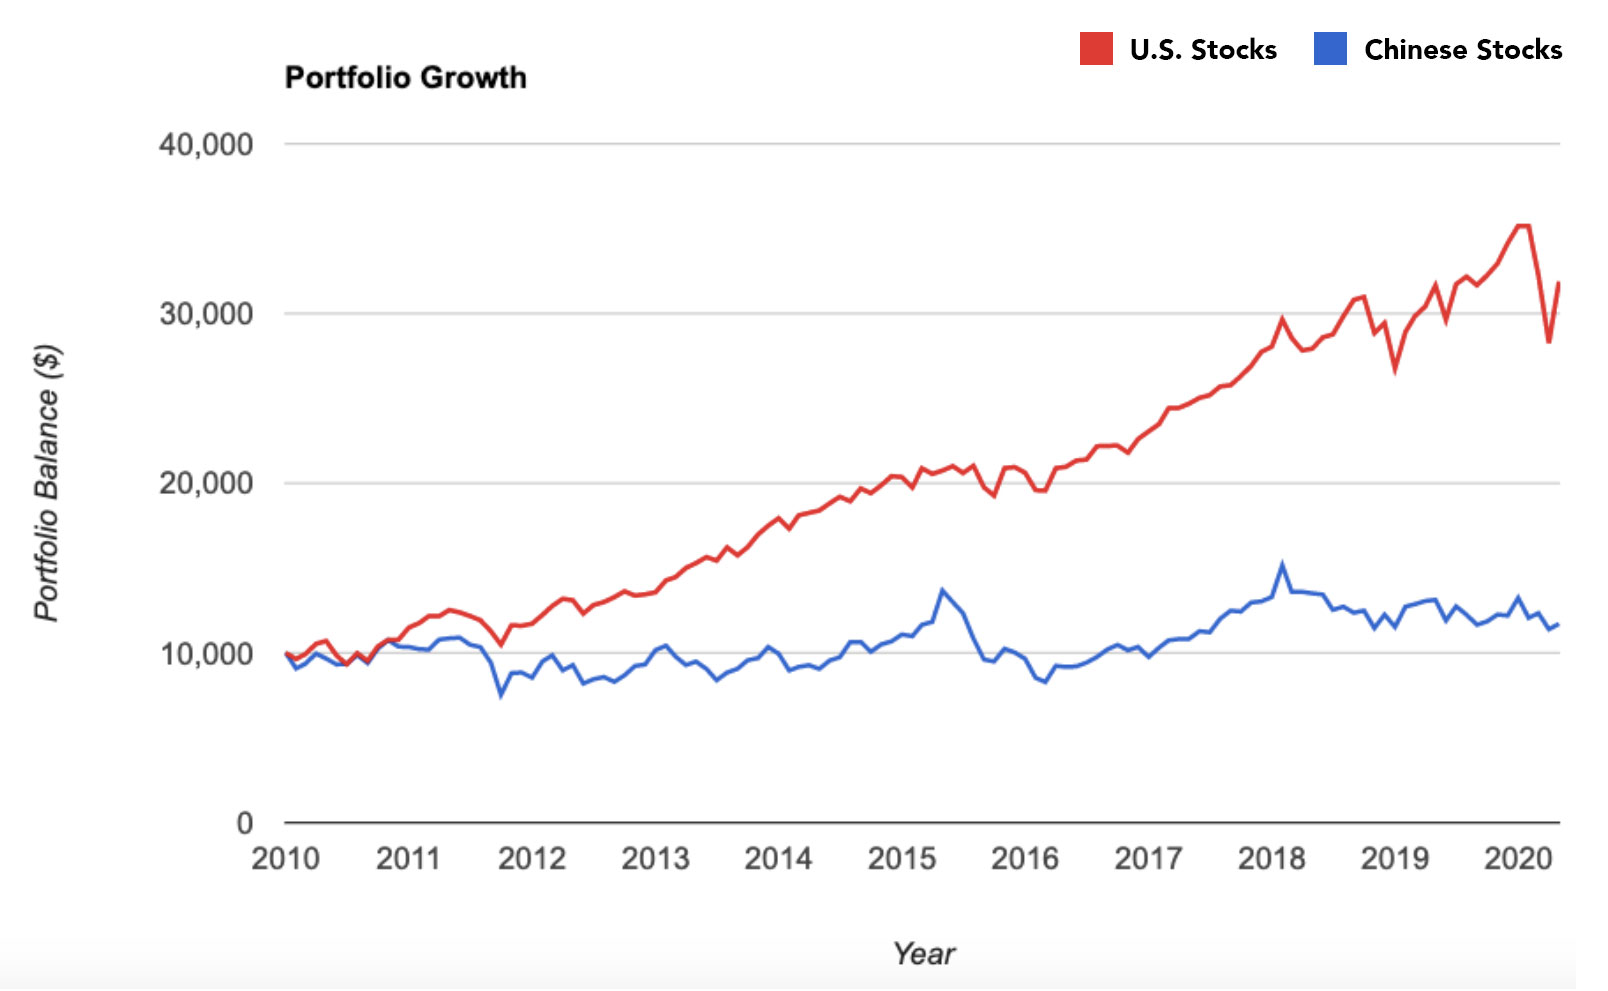 Graph of Chinese vs U.S. Stock